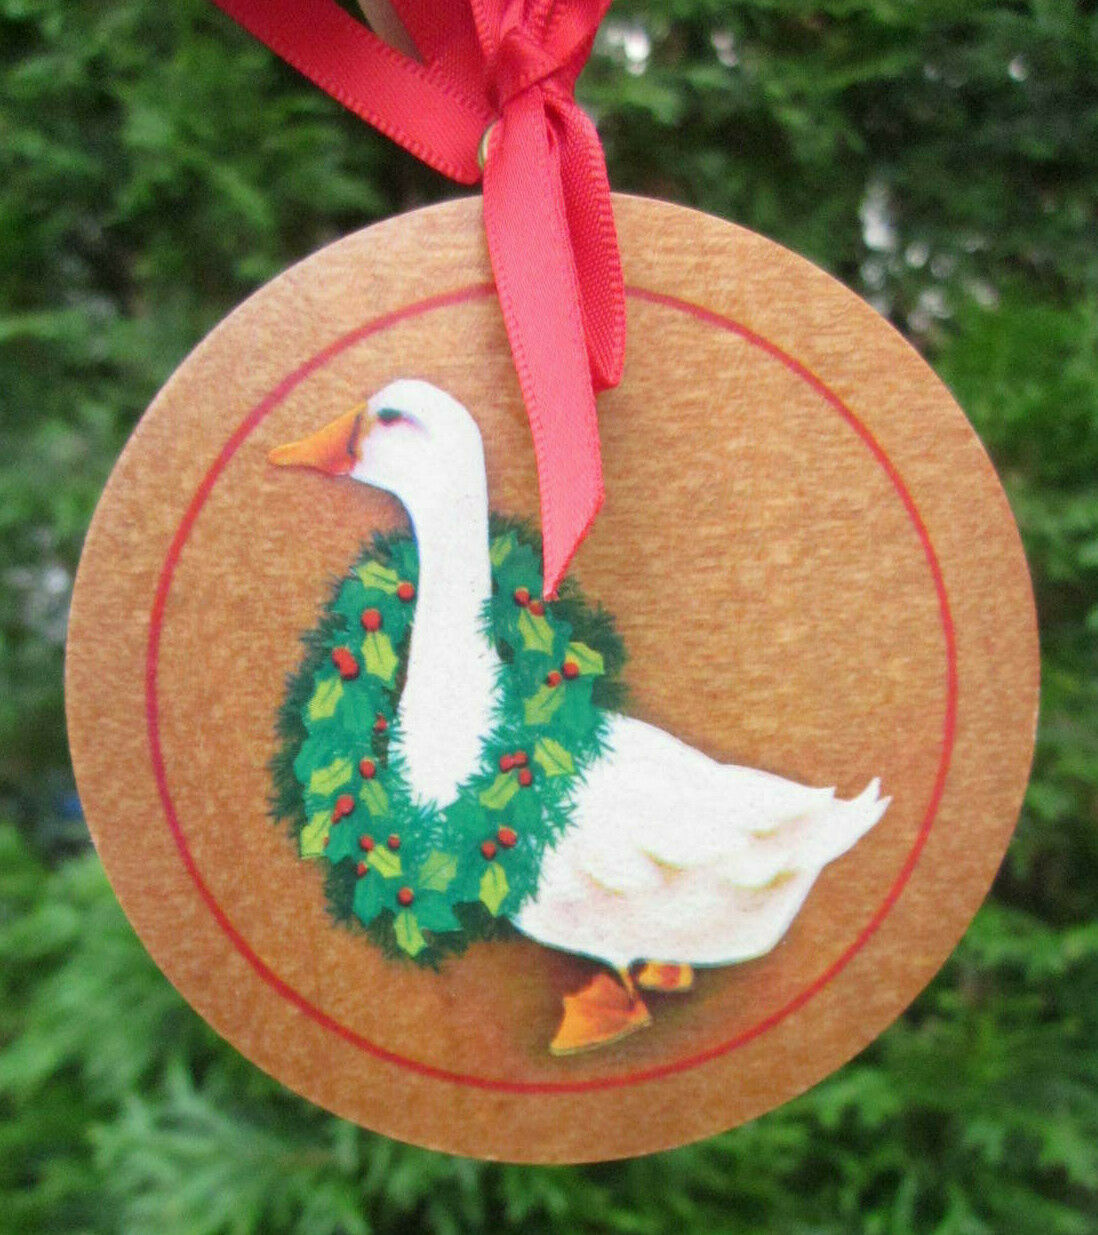 "Hallmark Cards Hardwood Christmas Ornament 1985 Goose Duck Wearing Wreath 3"" - $4.75"